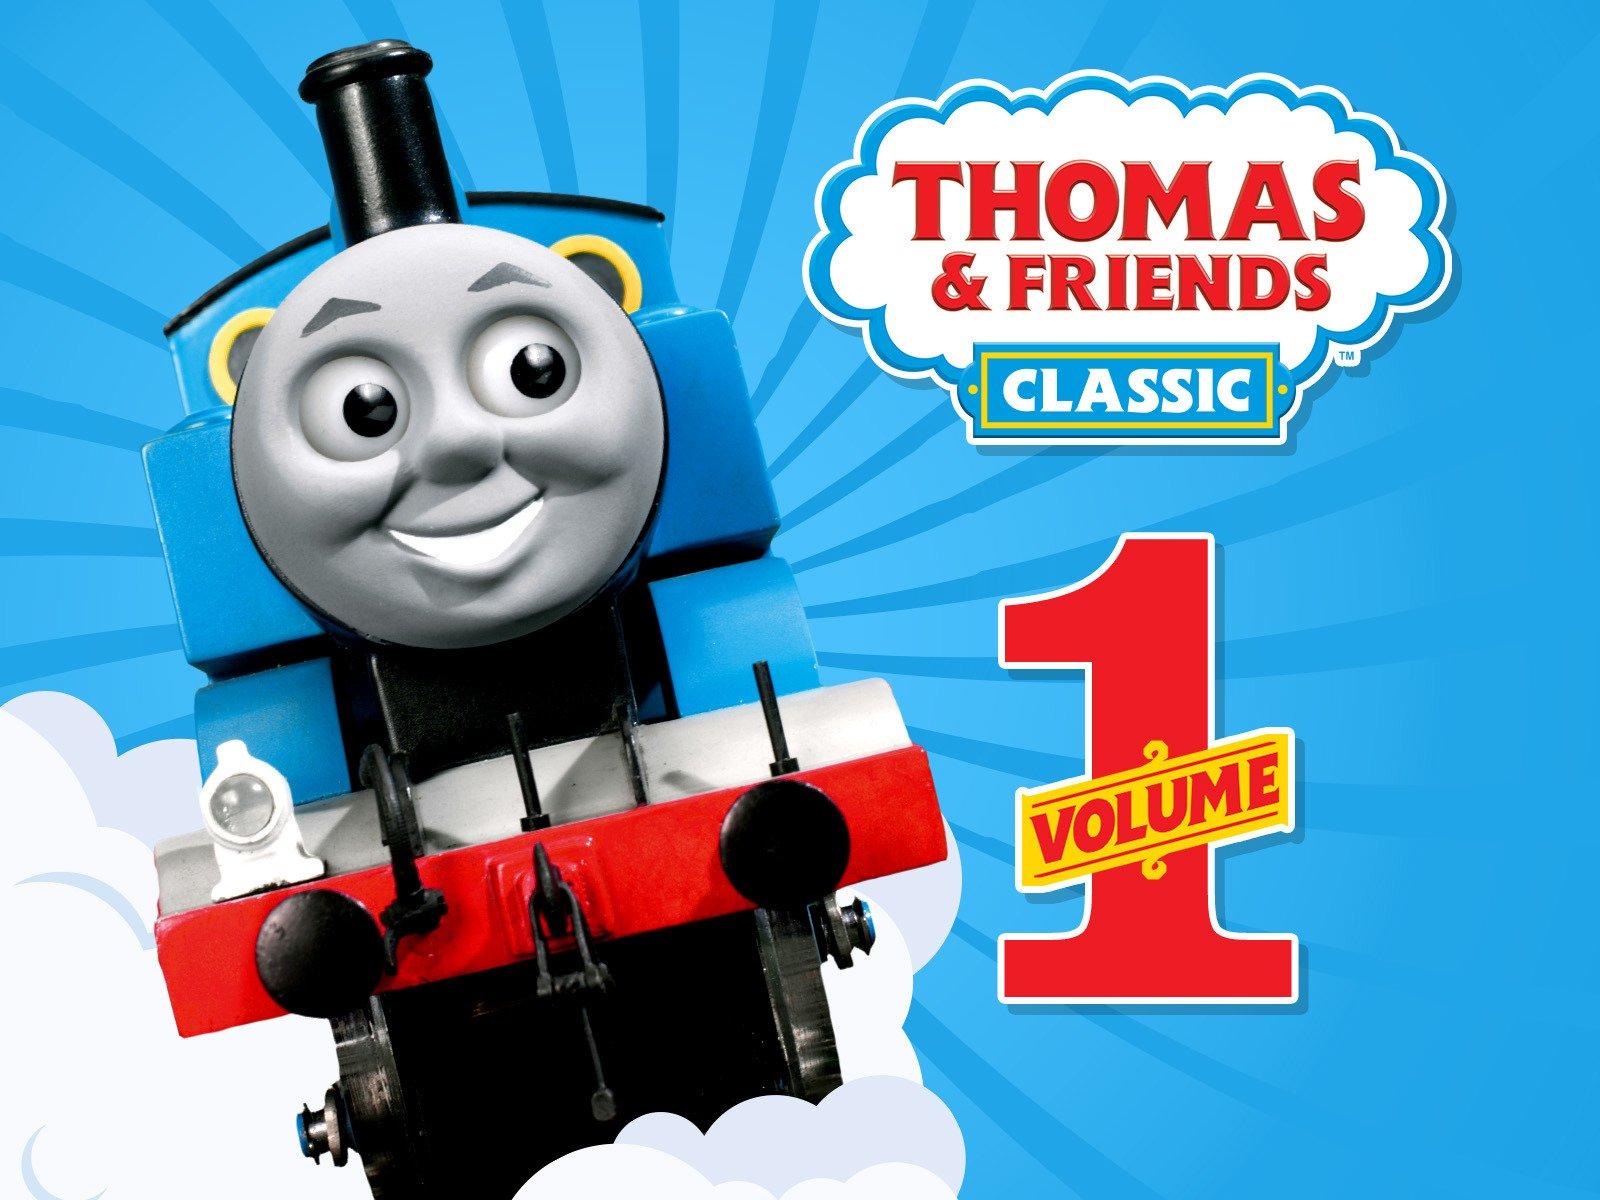 Thomas & Friends Classic Volume 1